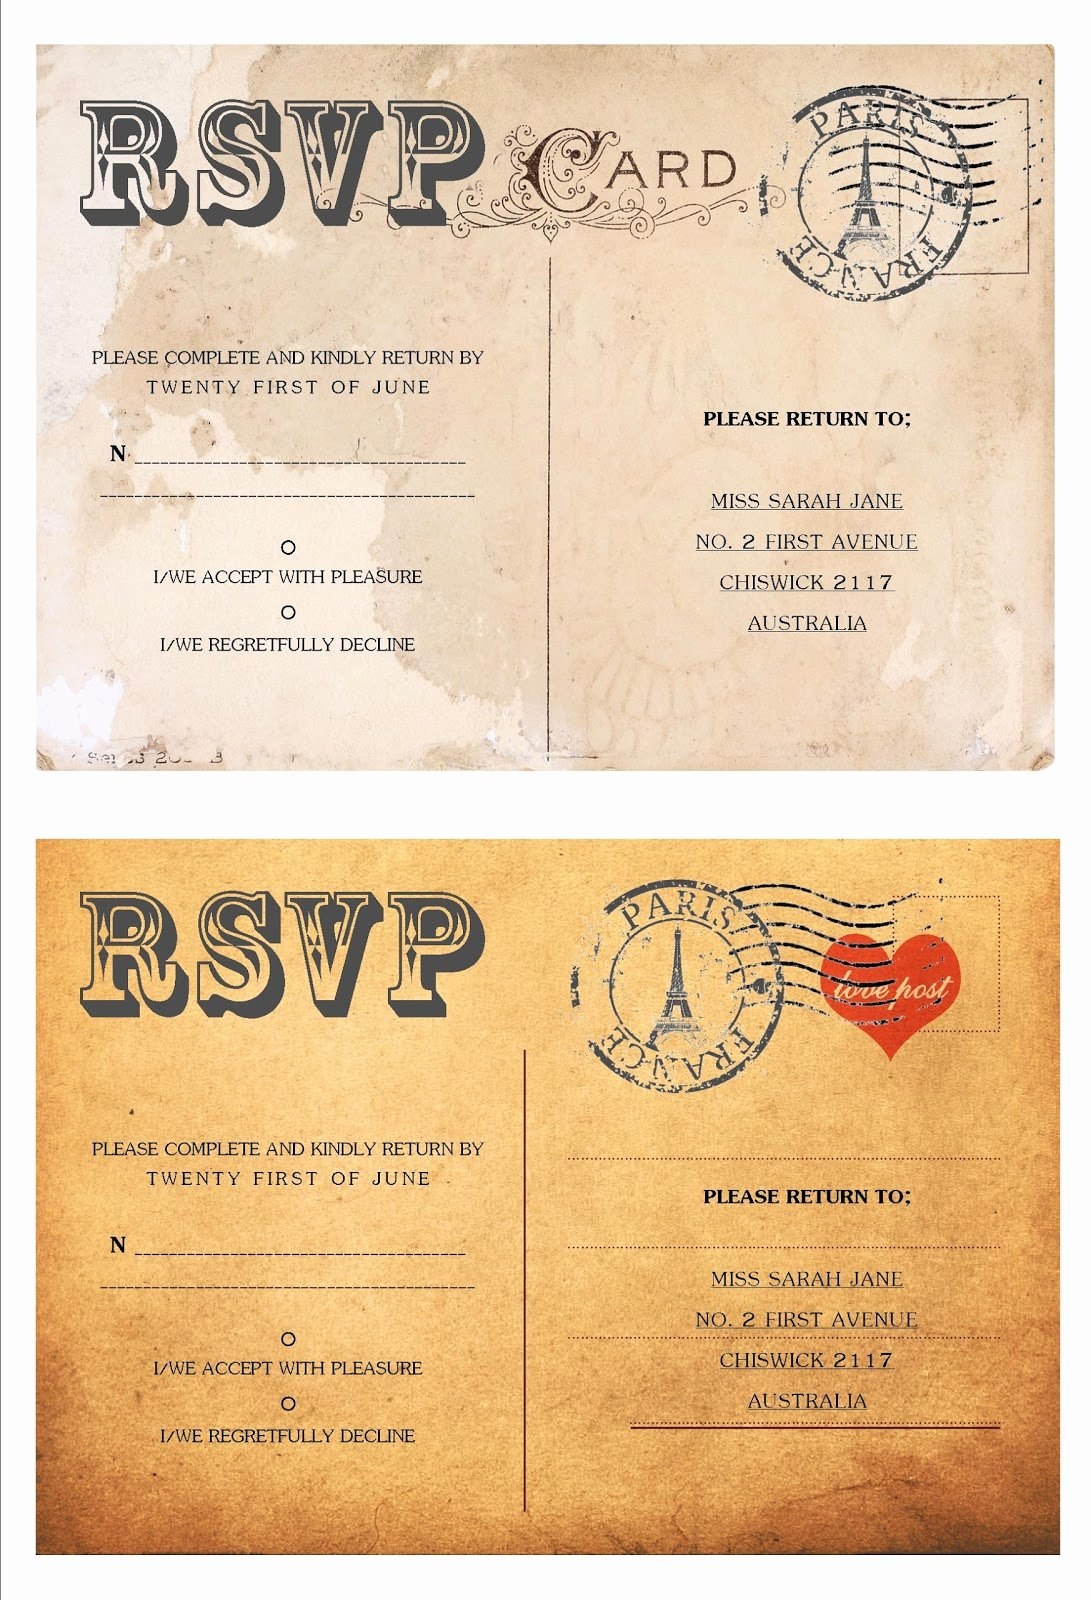 Postcard Wedding Invitations Template Unique Effortless Weddings Stationery April 2011